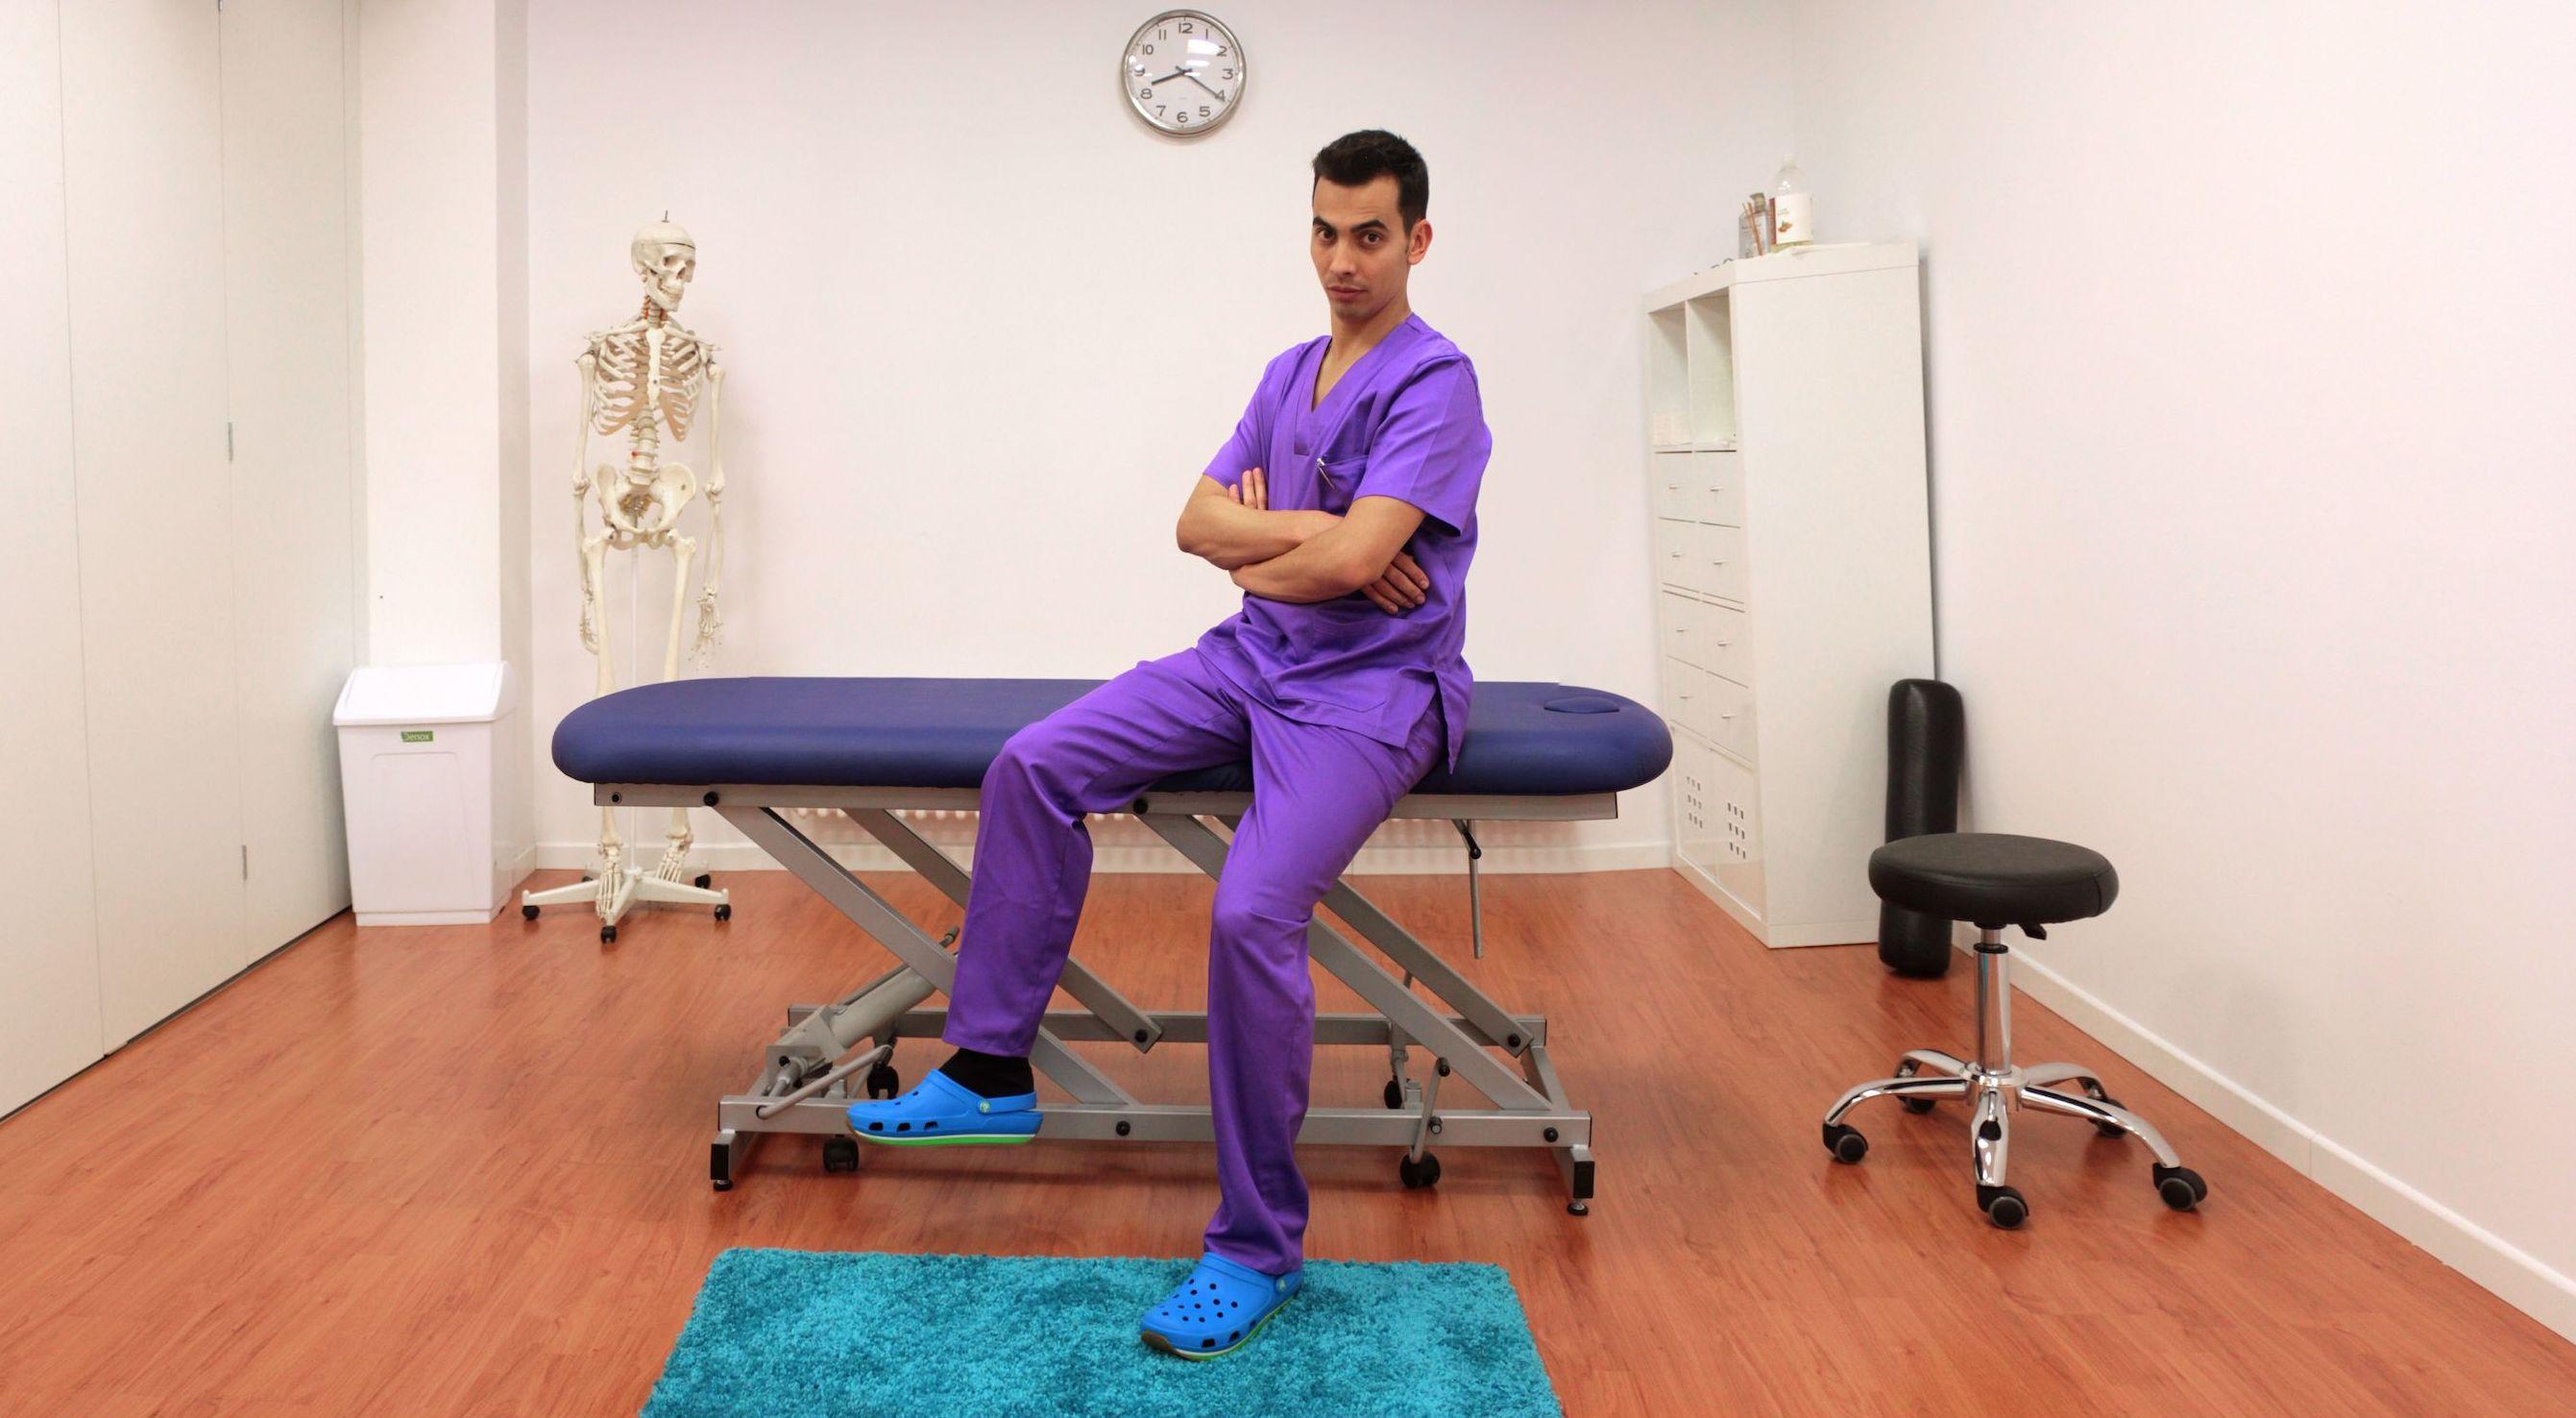 Qikronos, fisioterapia, osteopatía y acupuntura